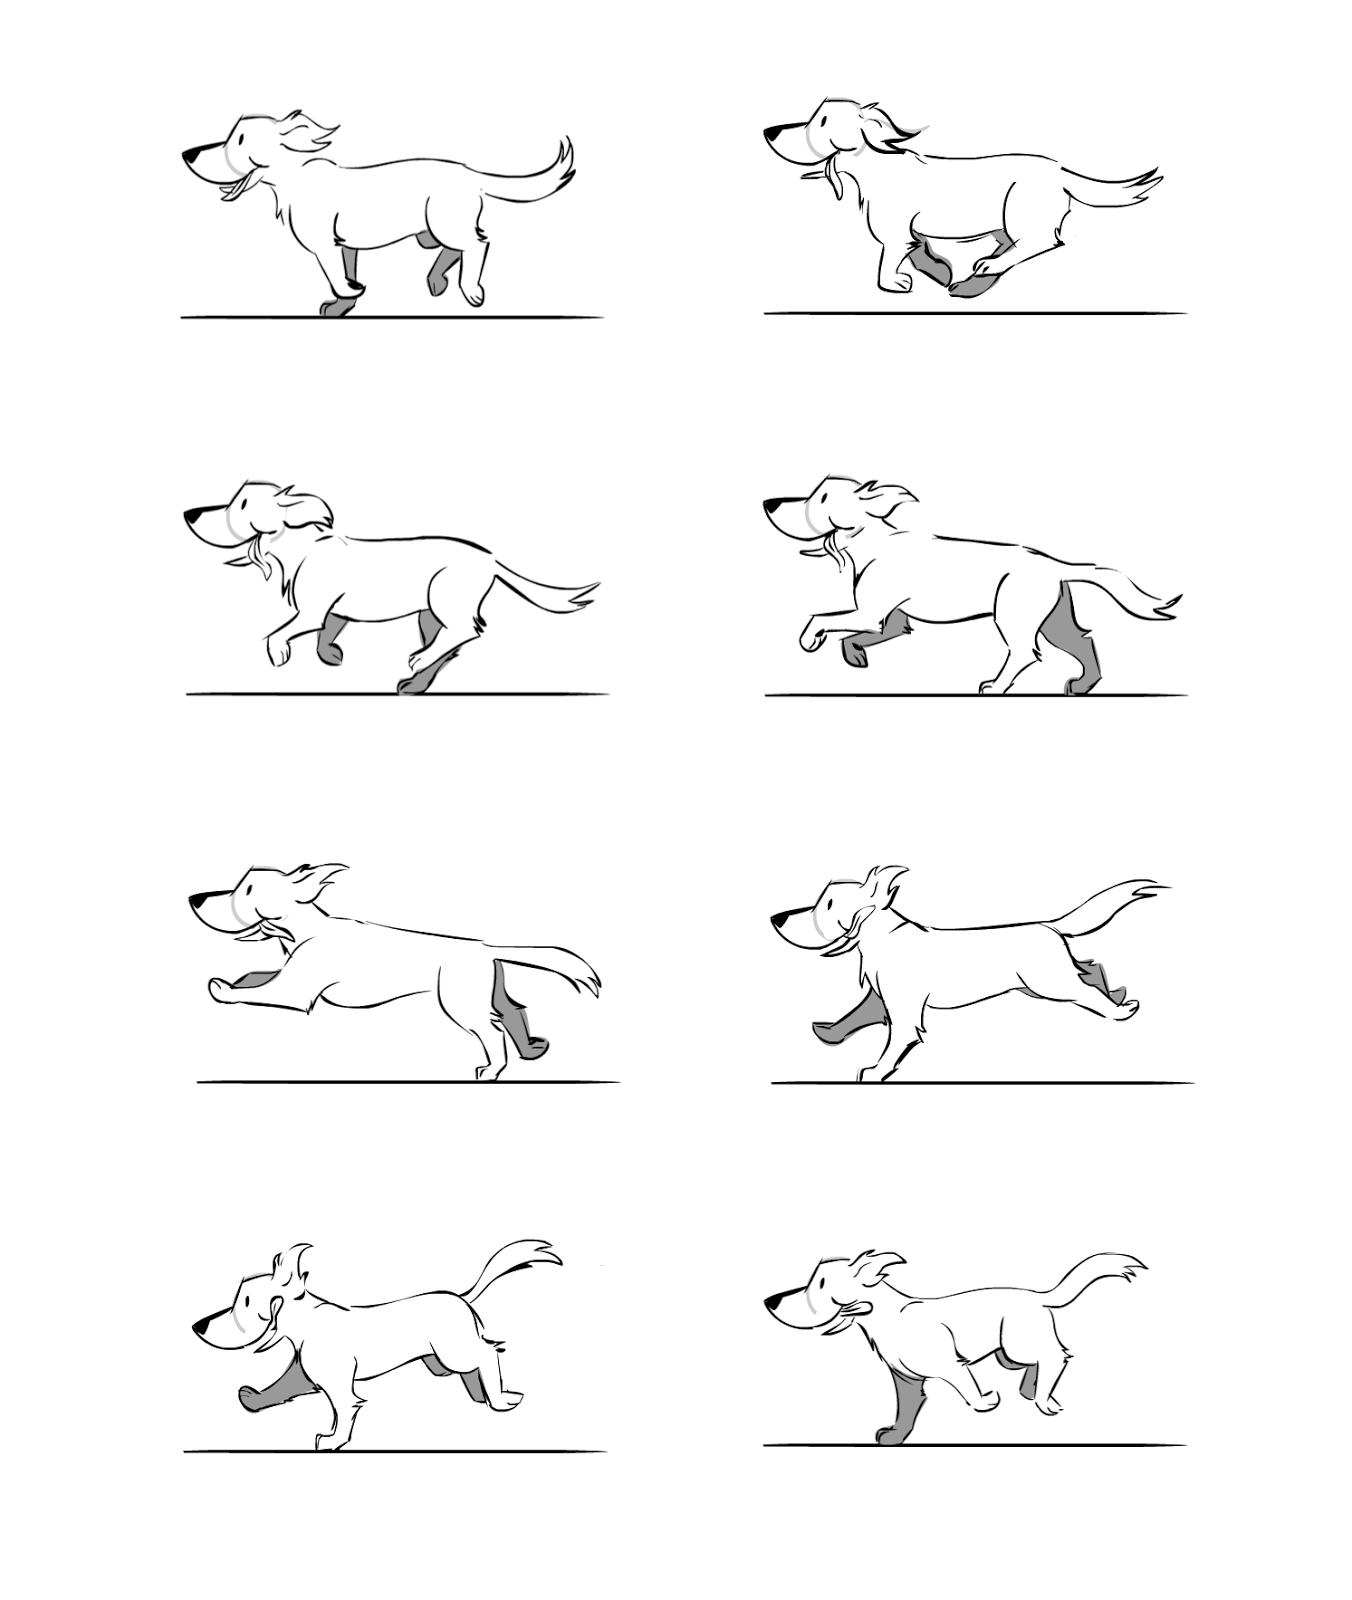 Dog Running Cycle